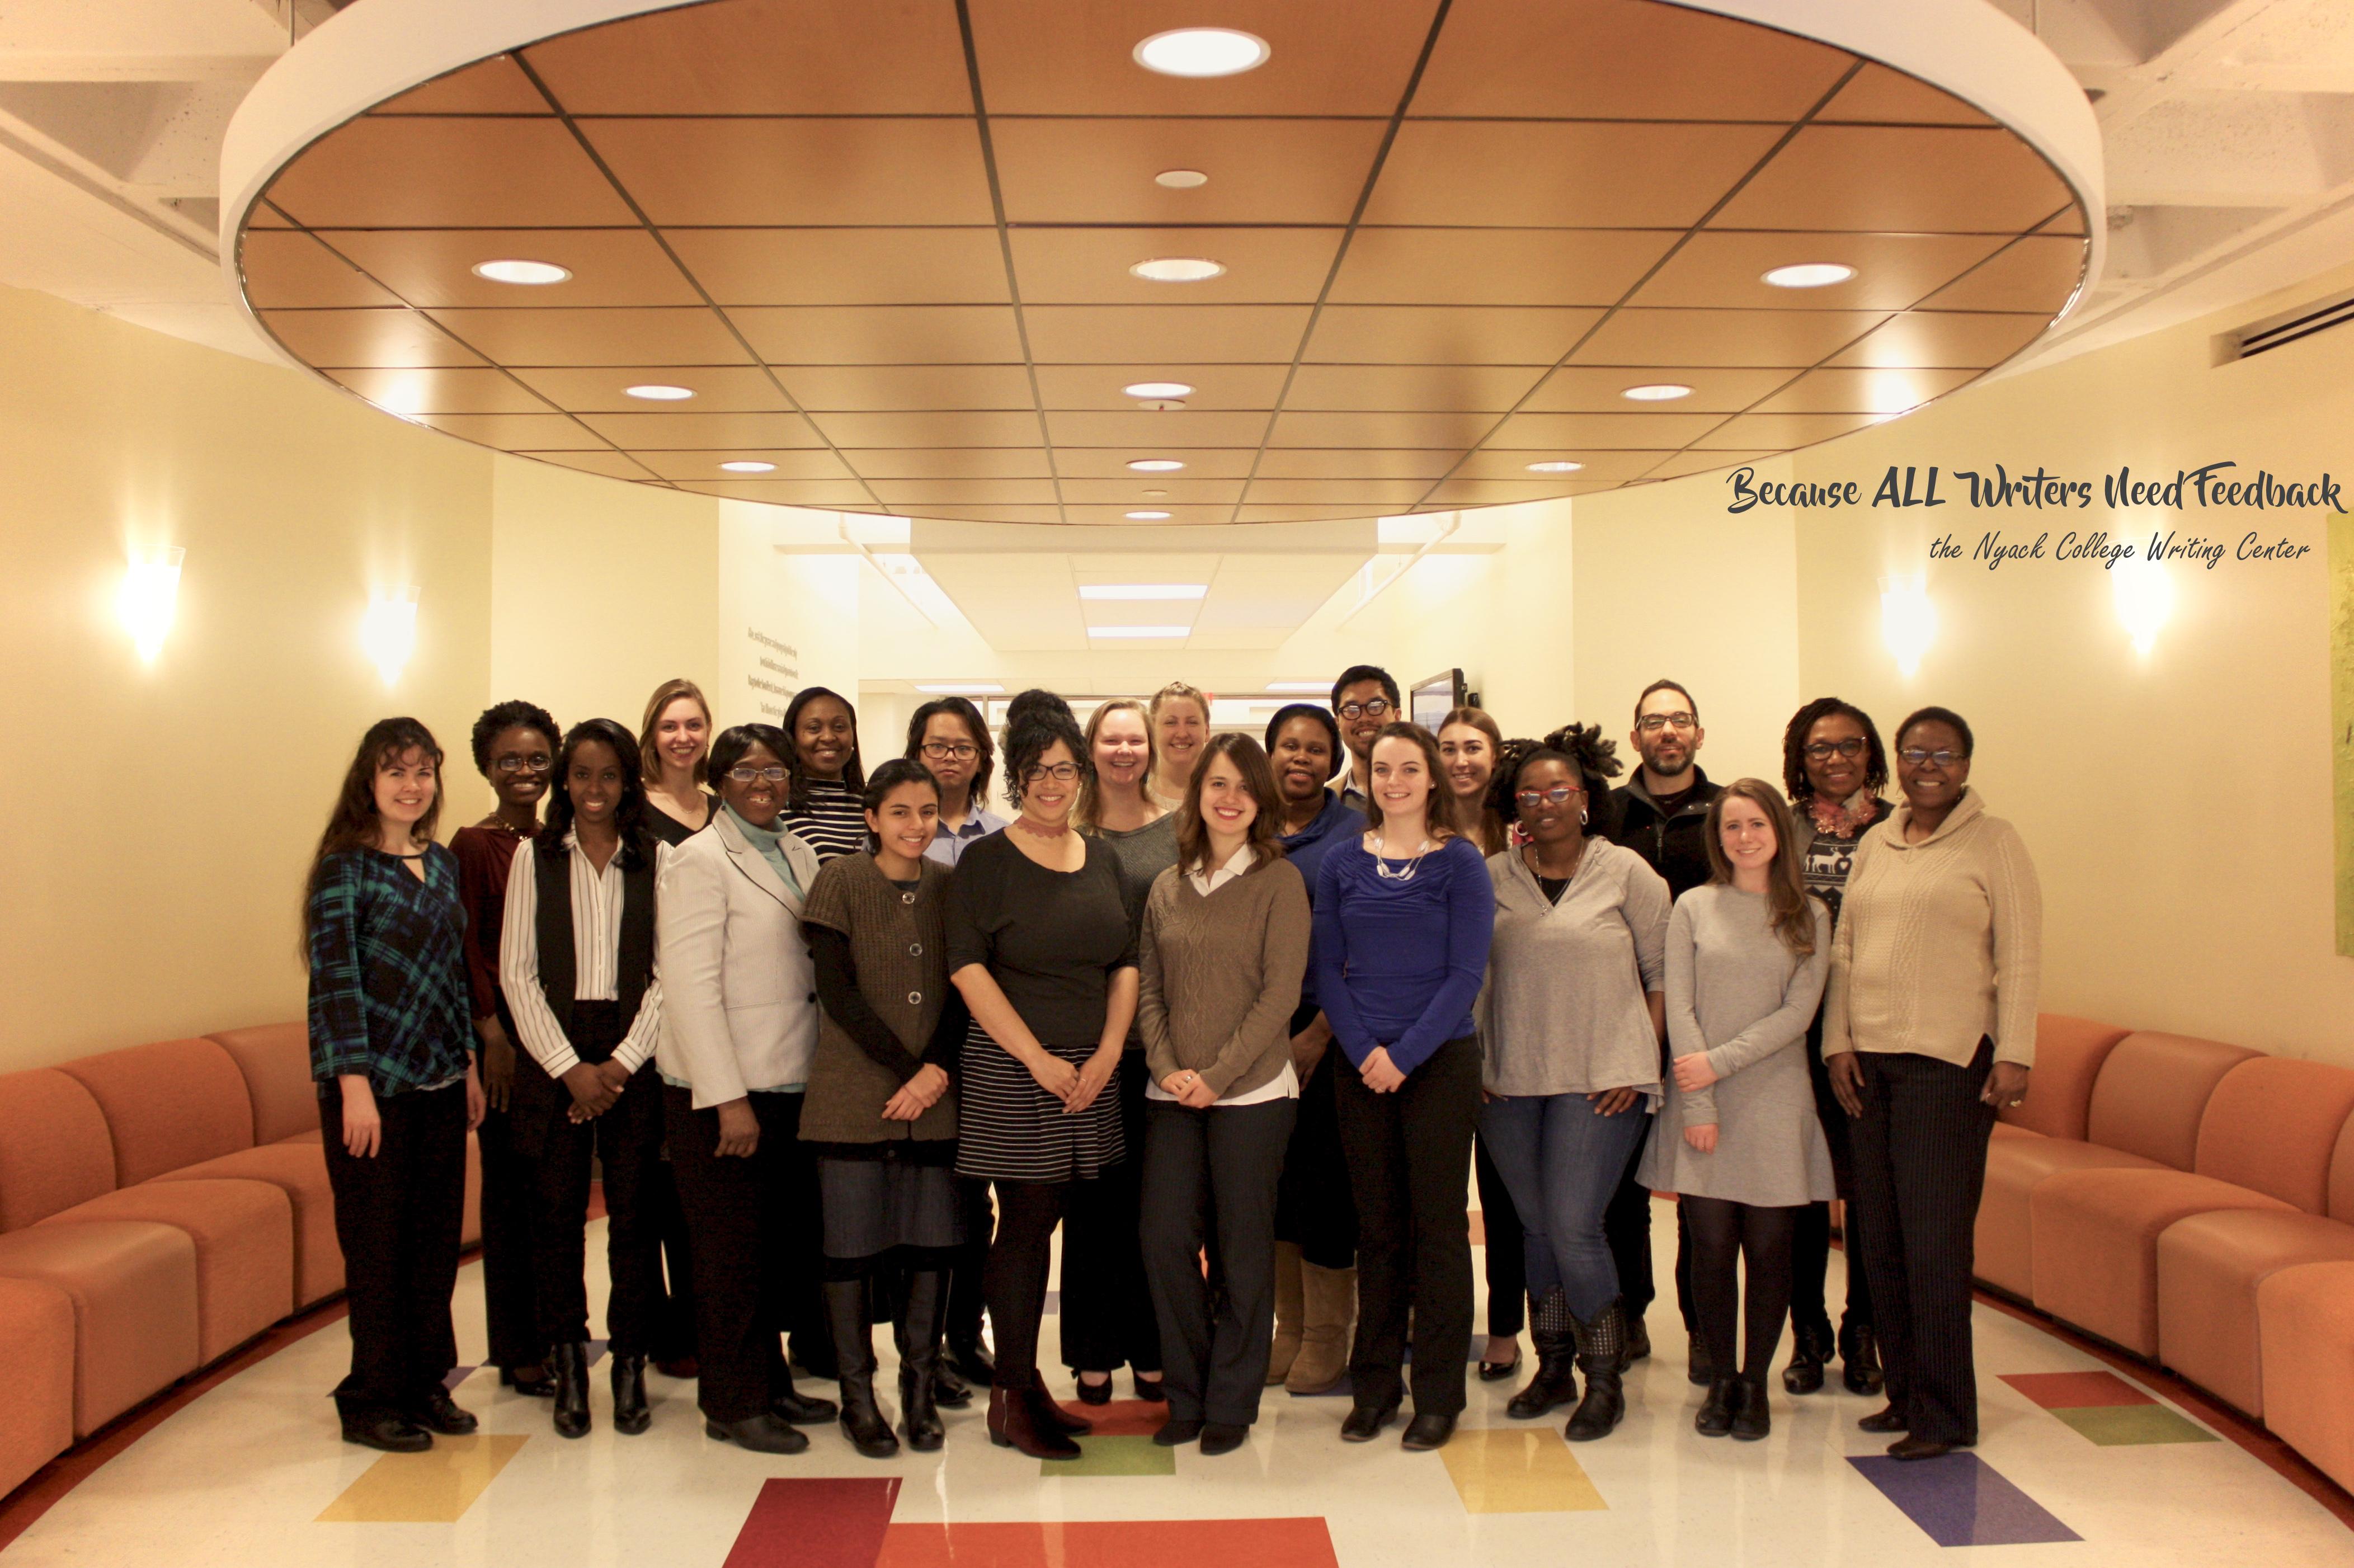 Nyack College Writing Center Staff